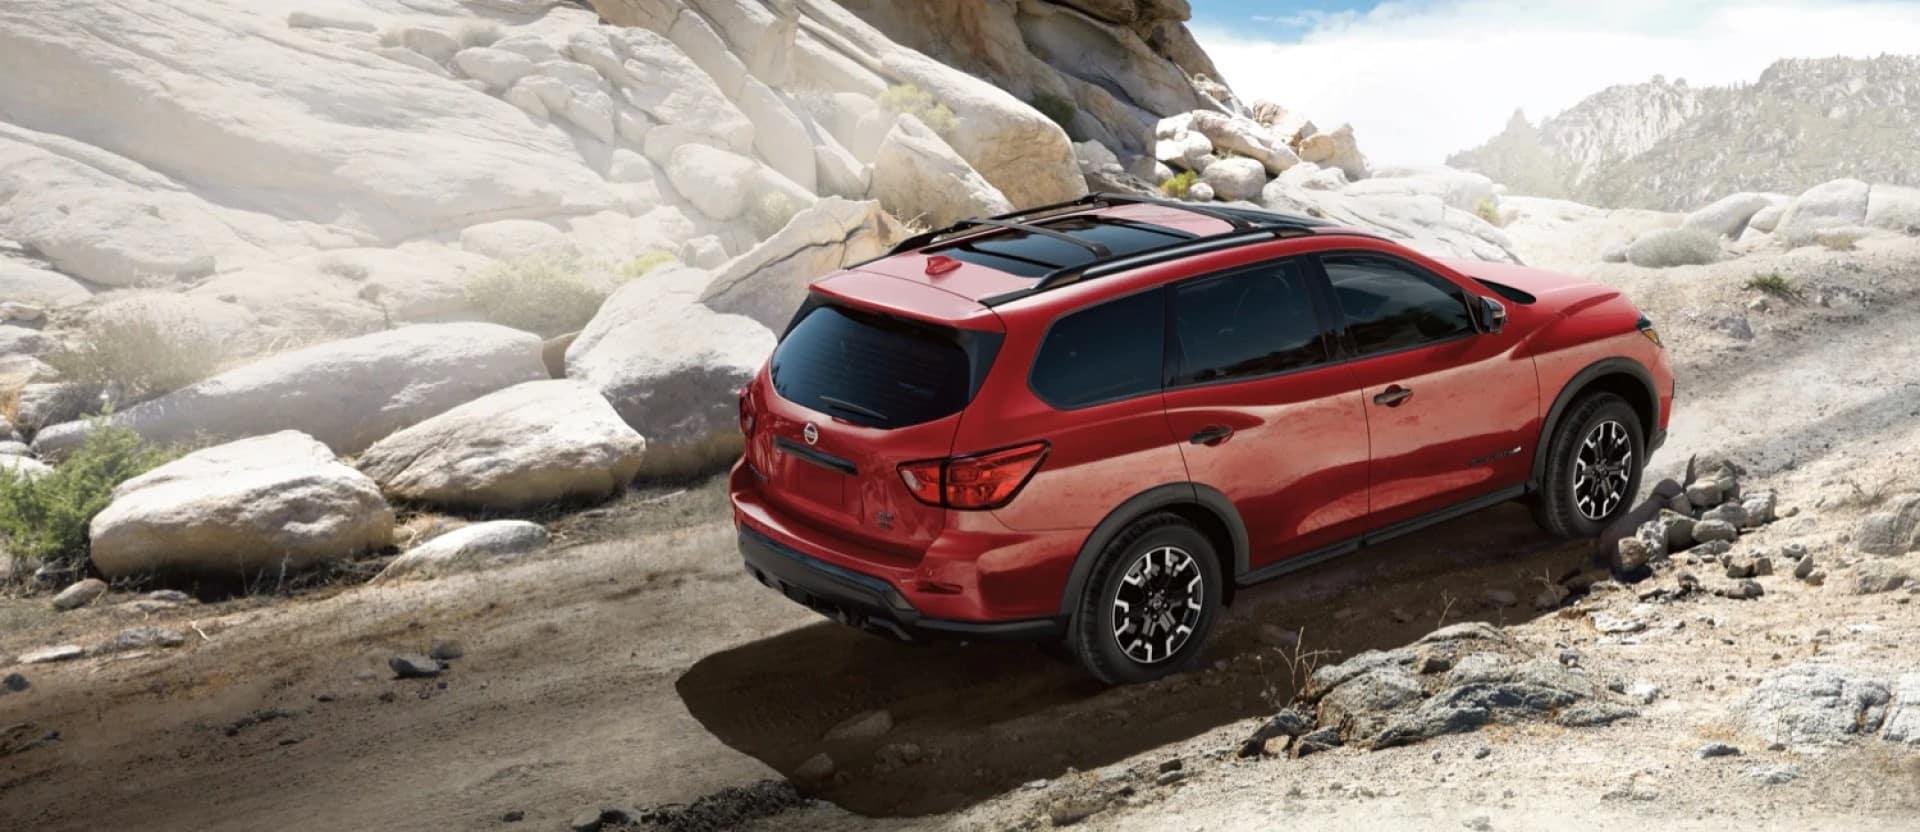 Nissan_Pathfinder_Driving_On_Rocks